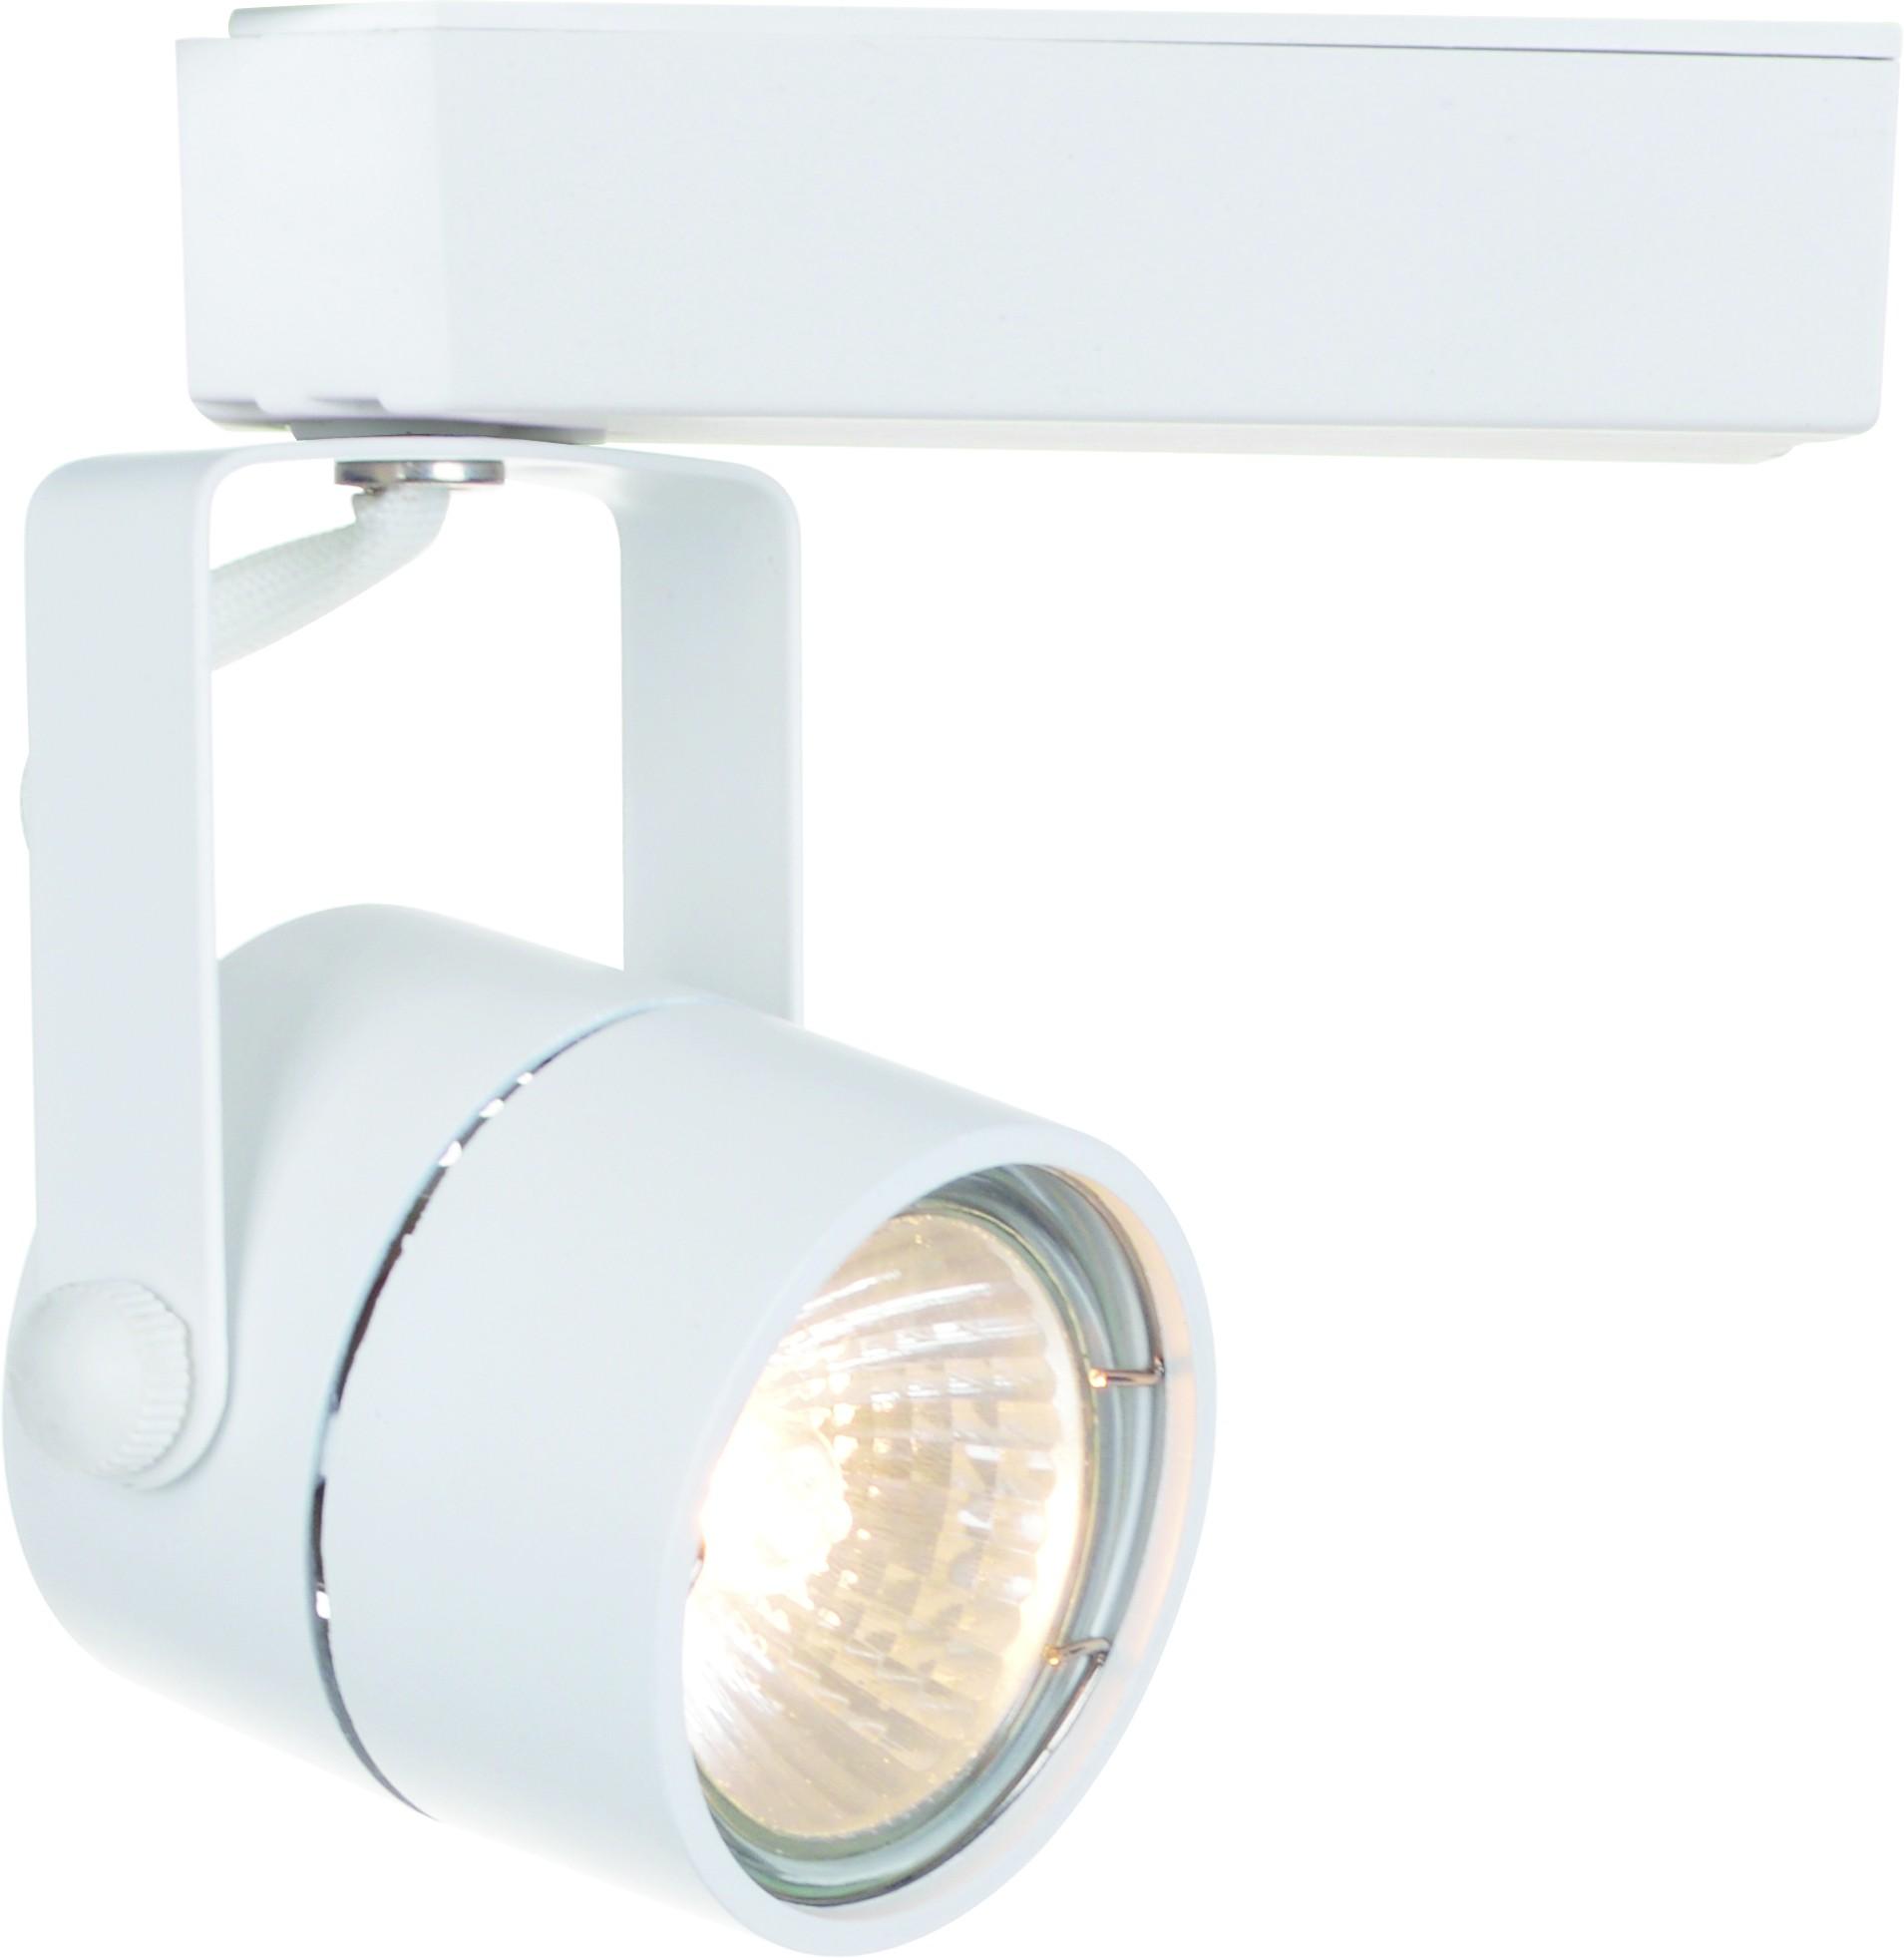 Трек система Arte lamp A1310pl-1wh